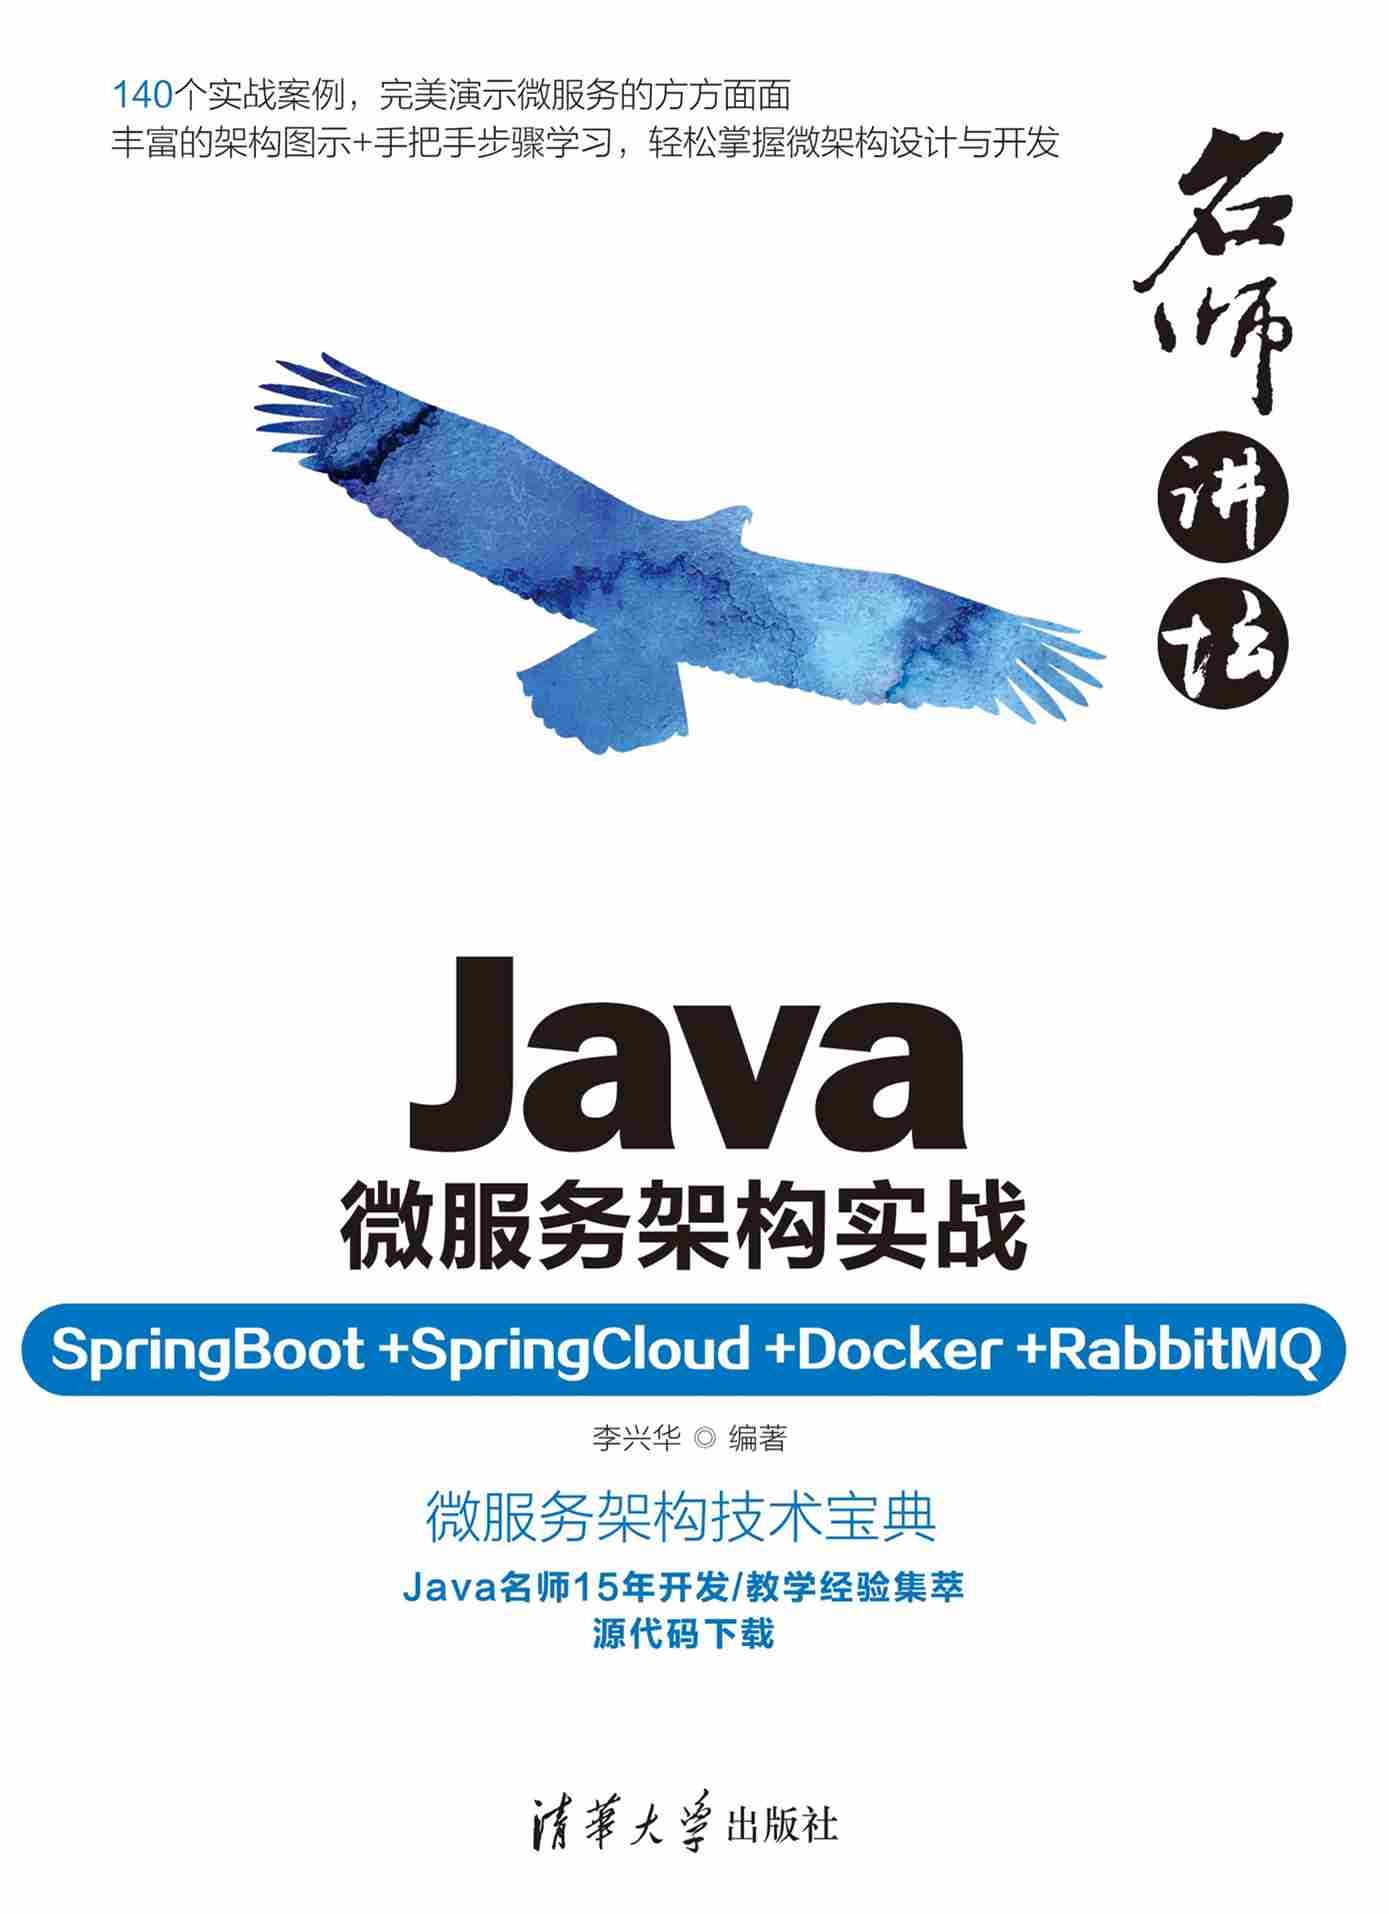 名師講壇——Java微服務架構實戰(SpringBoot+SpringCloud+Doc-preview-1